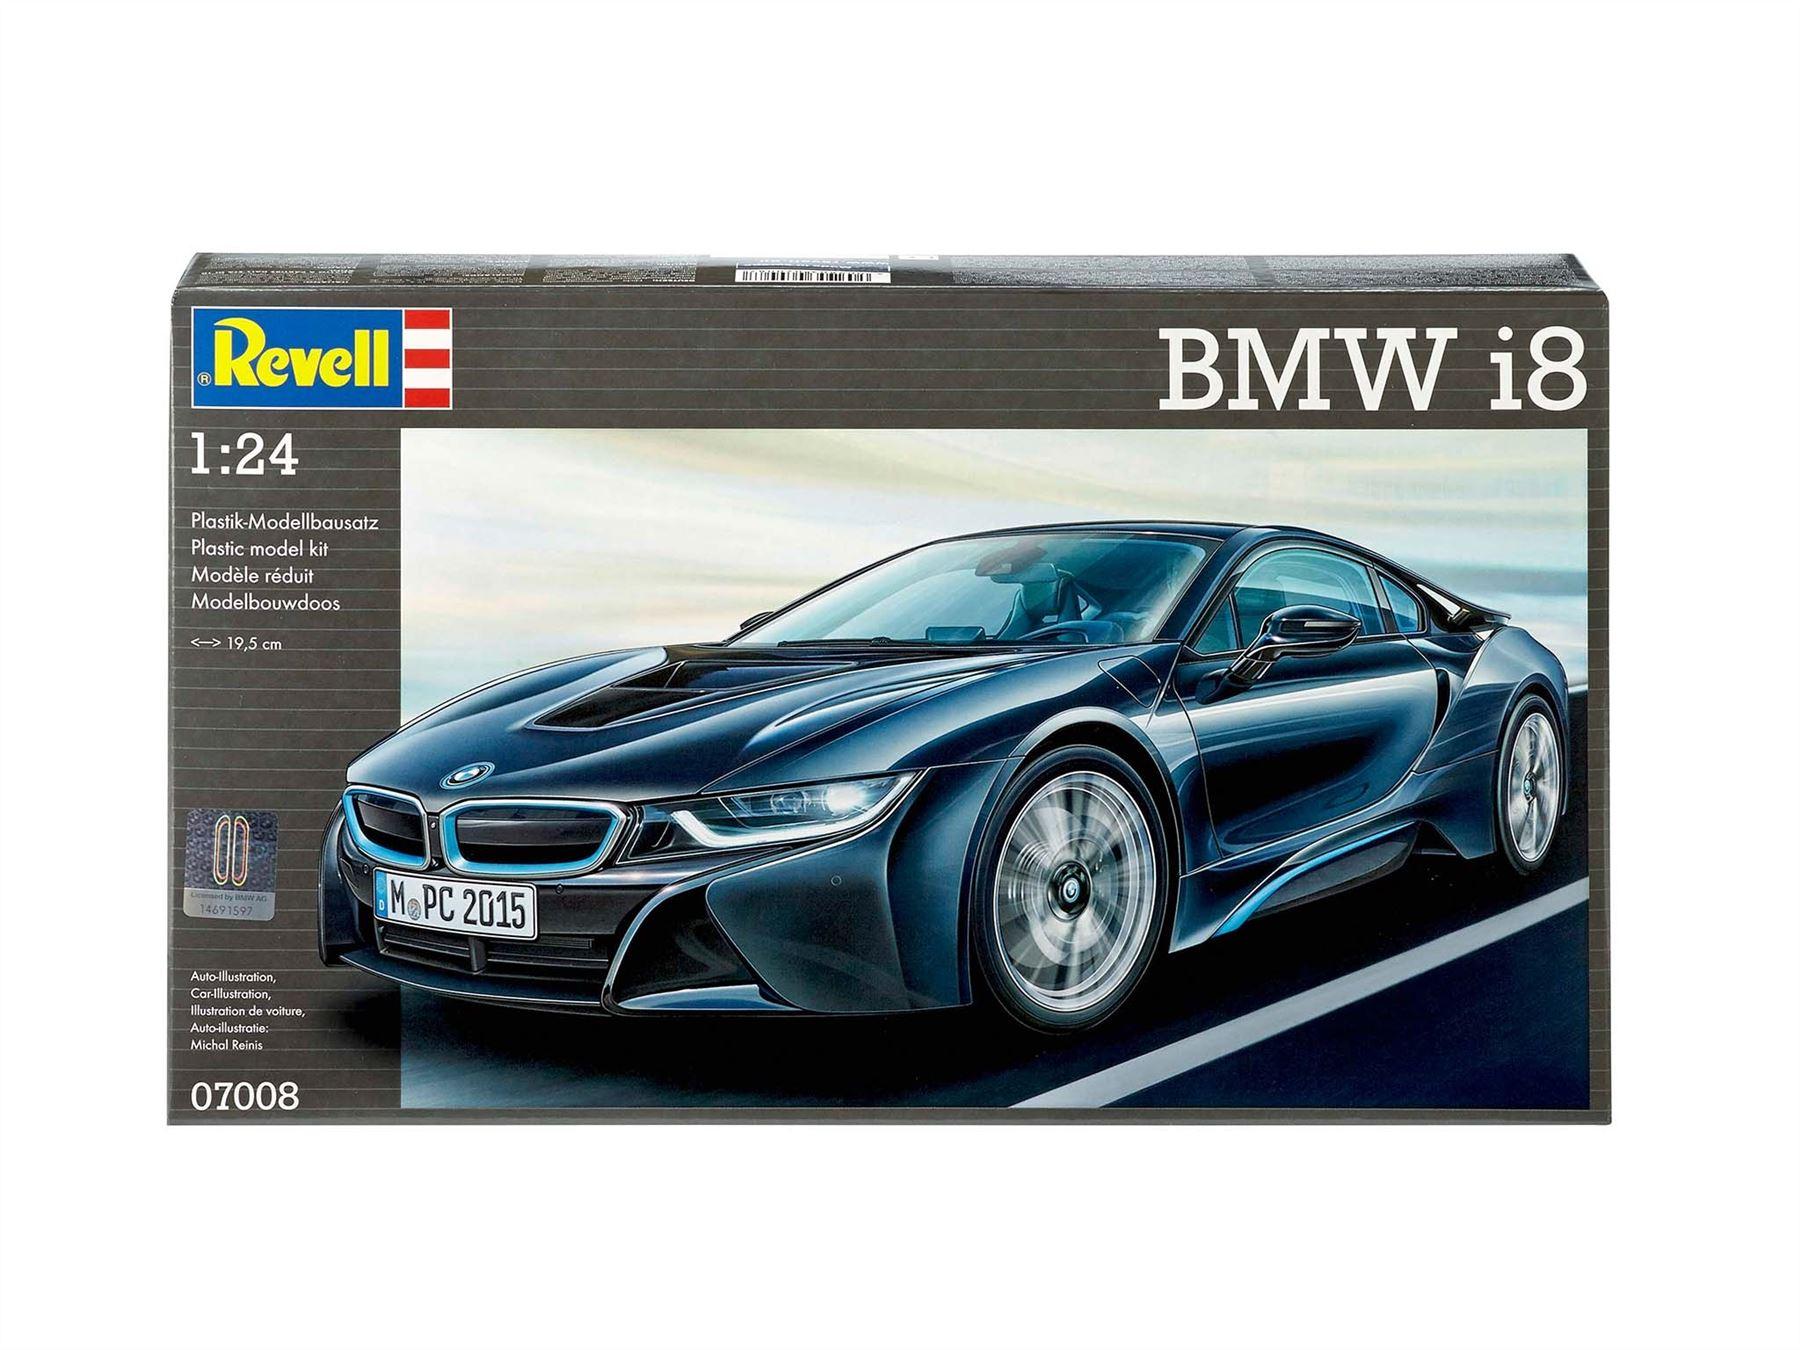 Revell Bmw I8 1 24 Model Kit 07008 4009803070087 Ebay